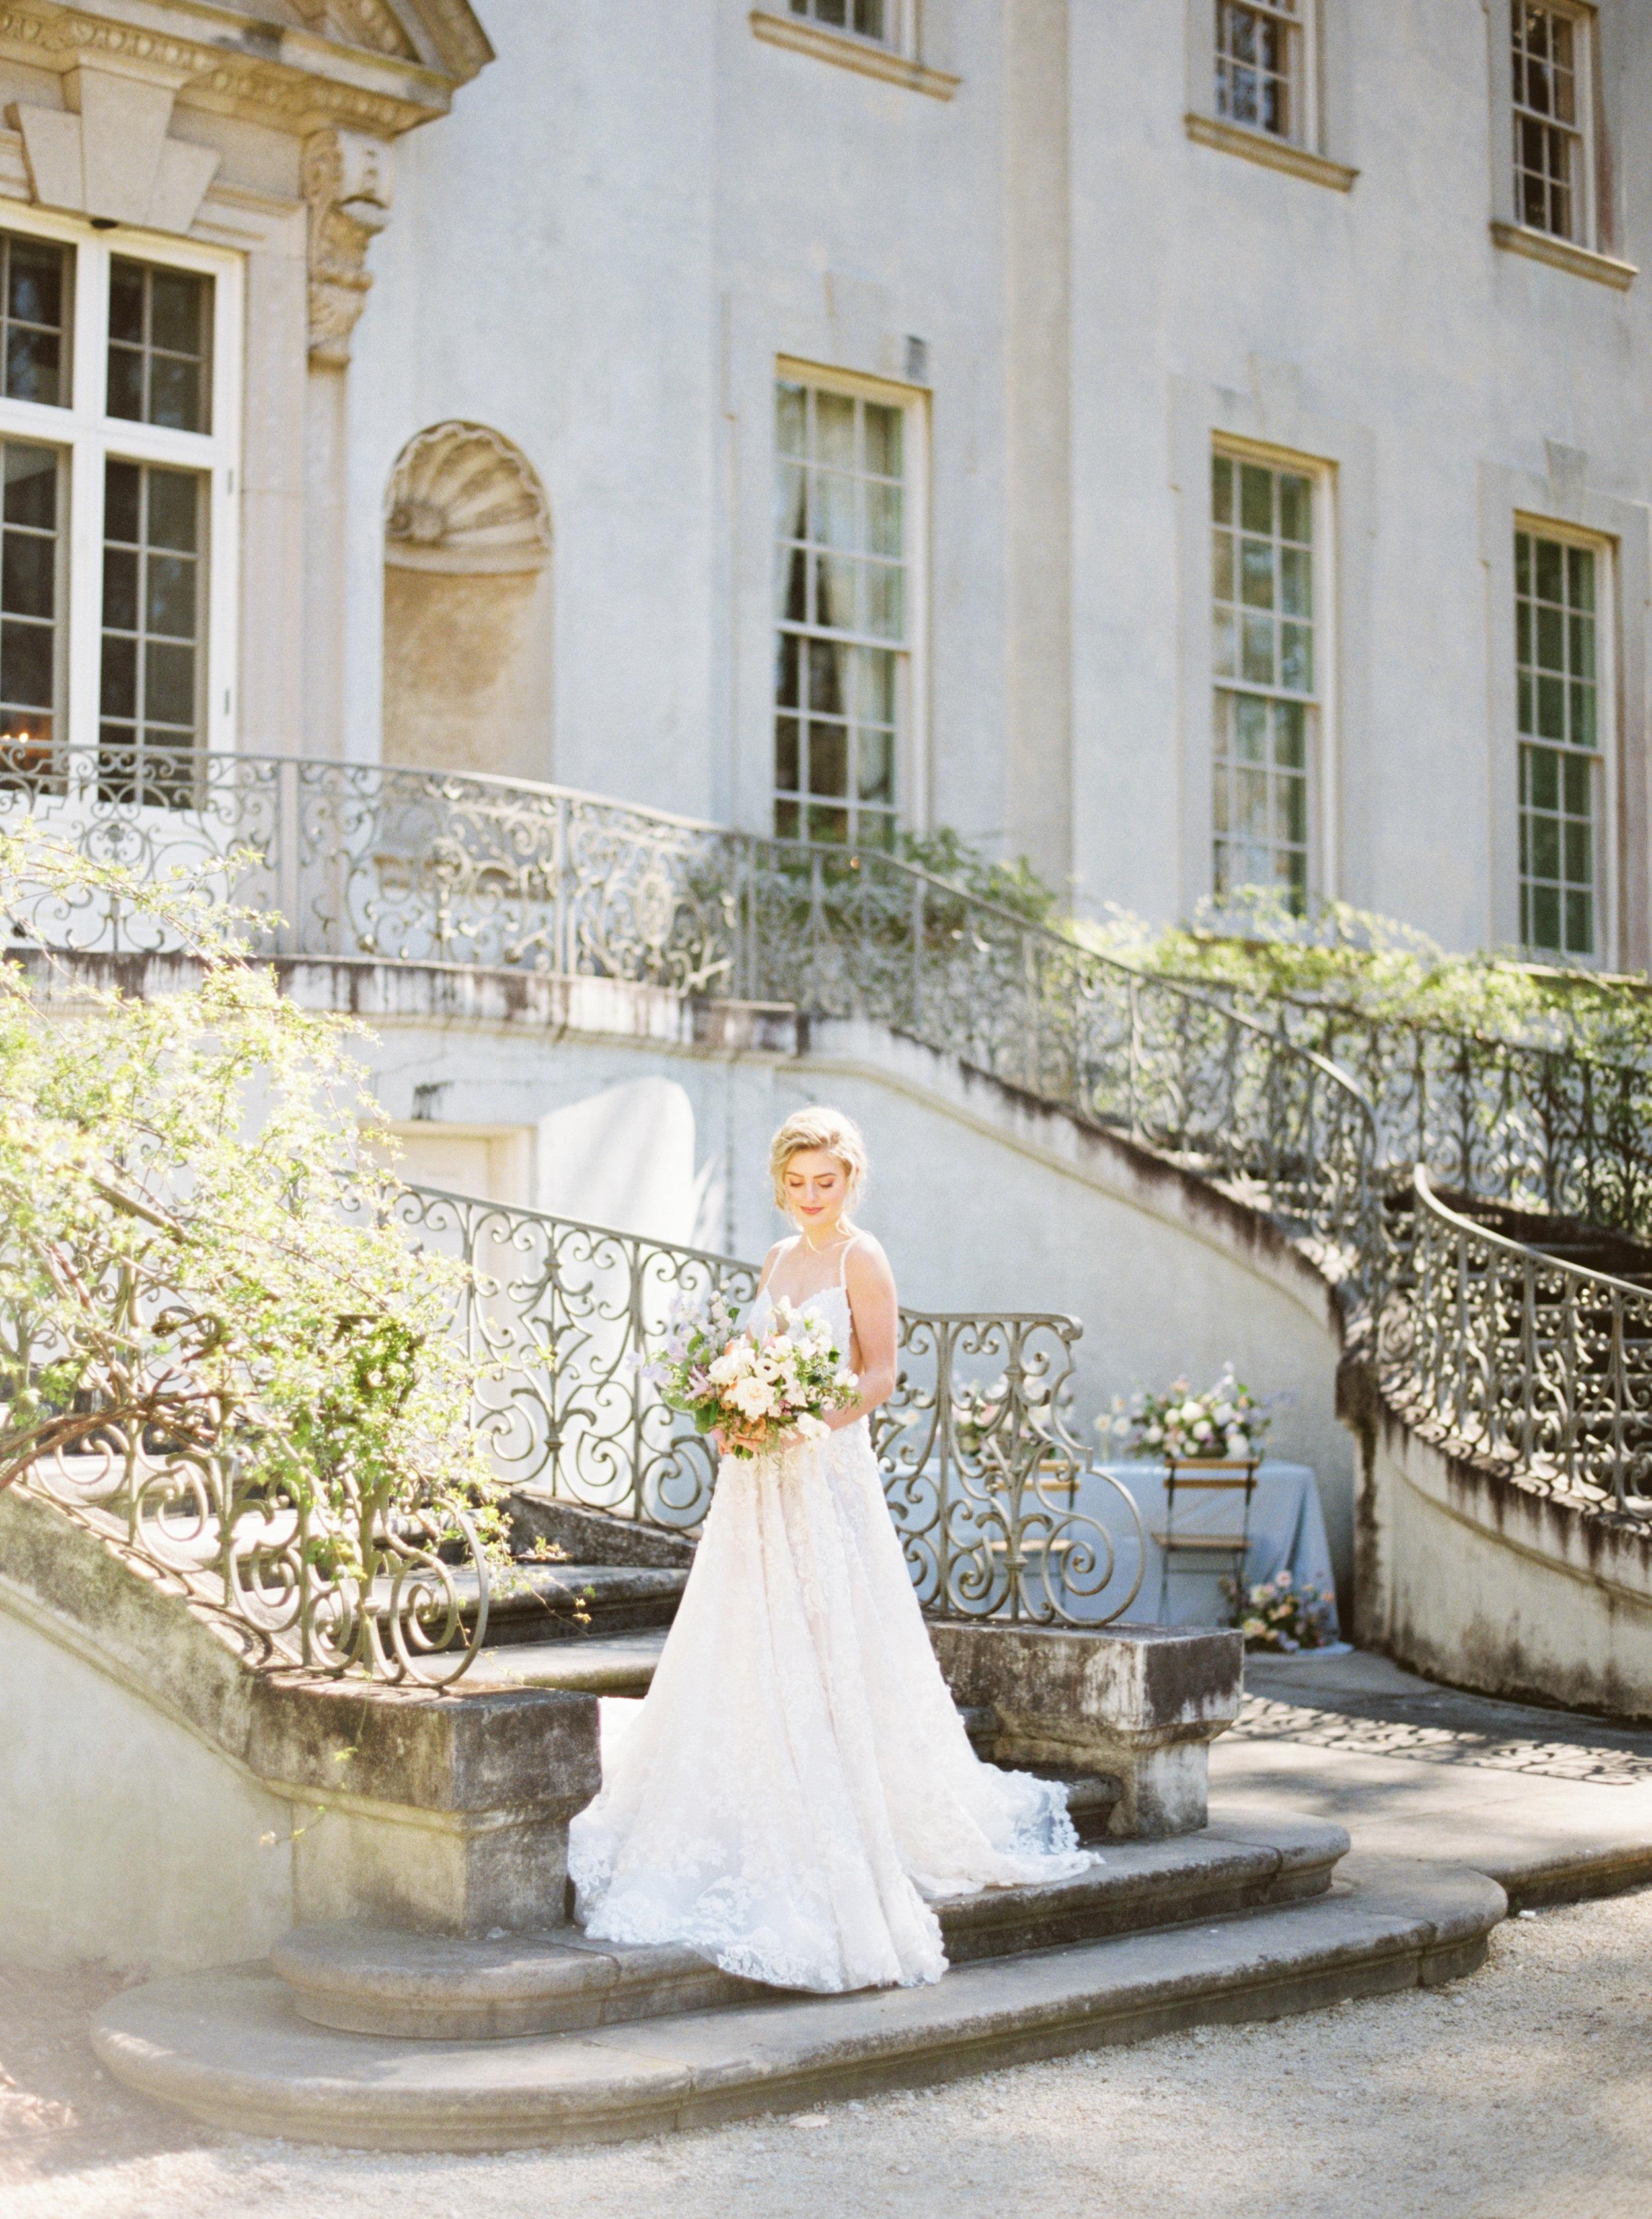 RachelOwensPhotography - Swan House -4.jpg